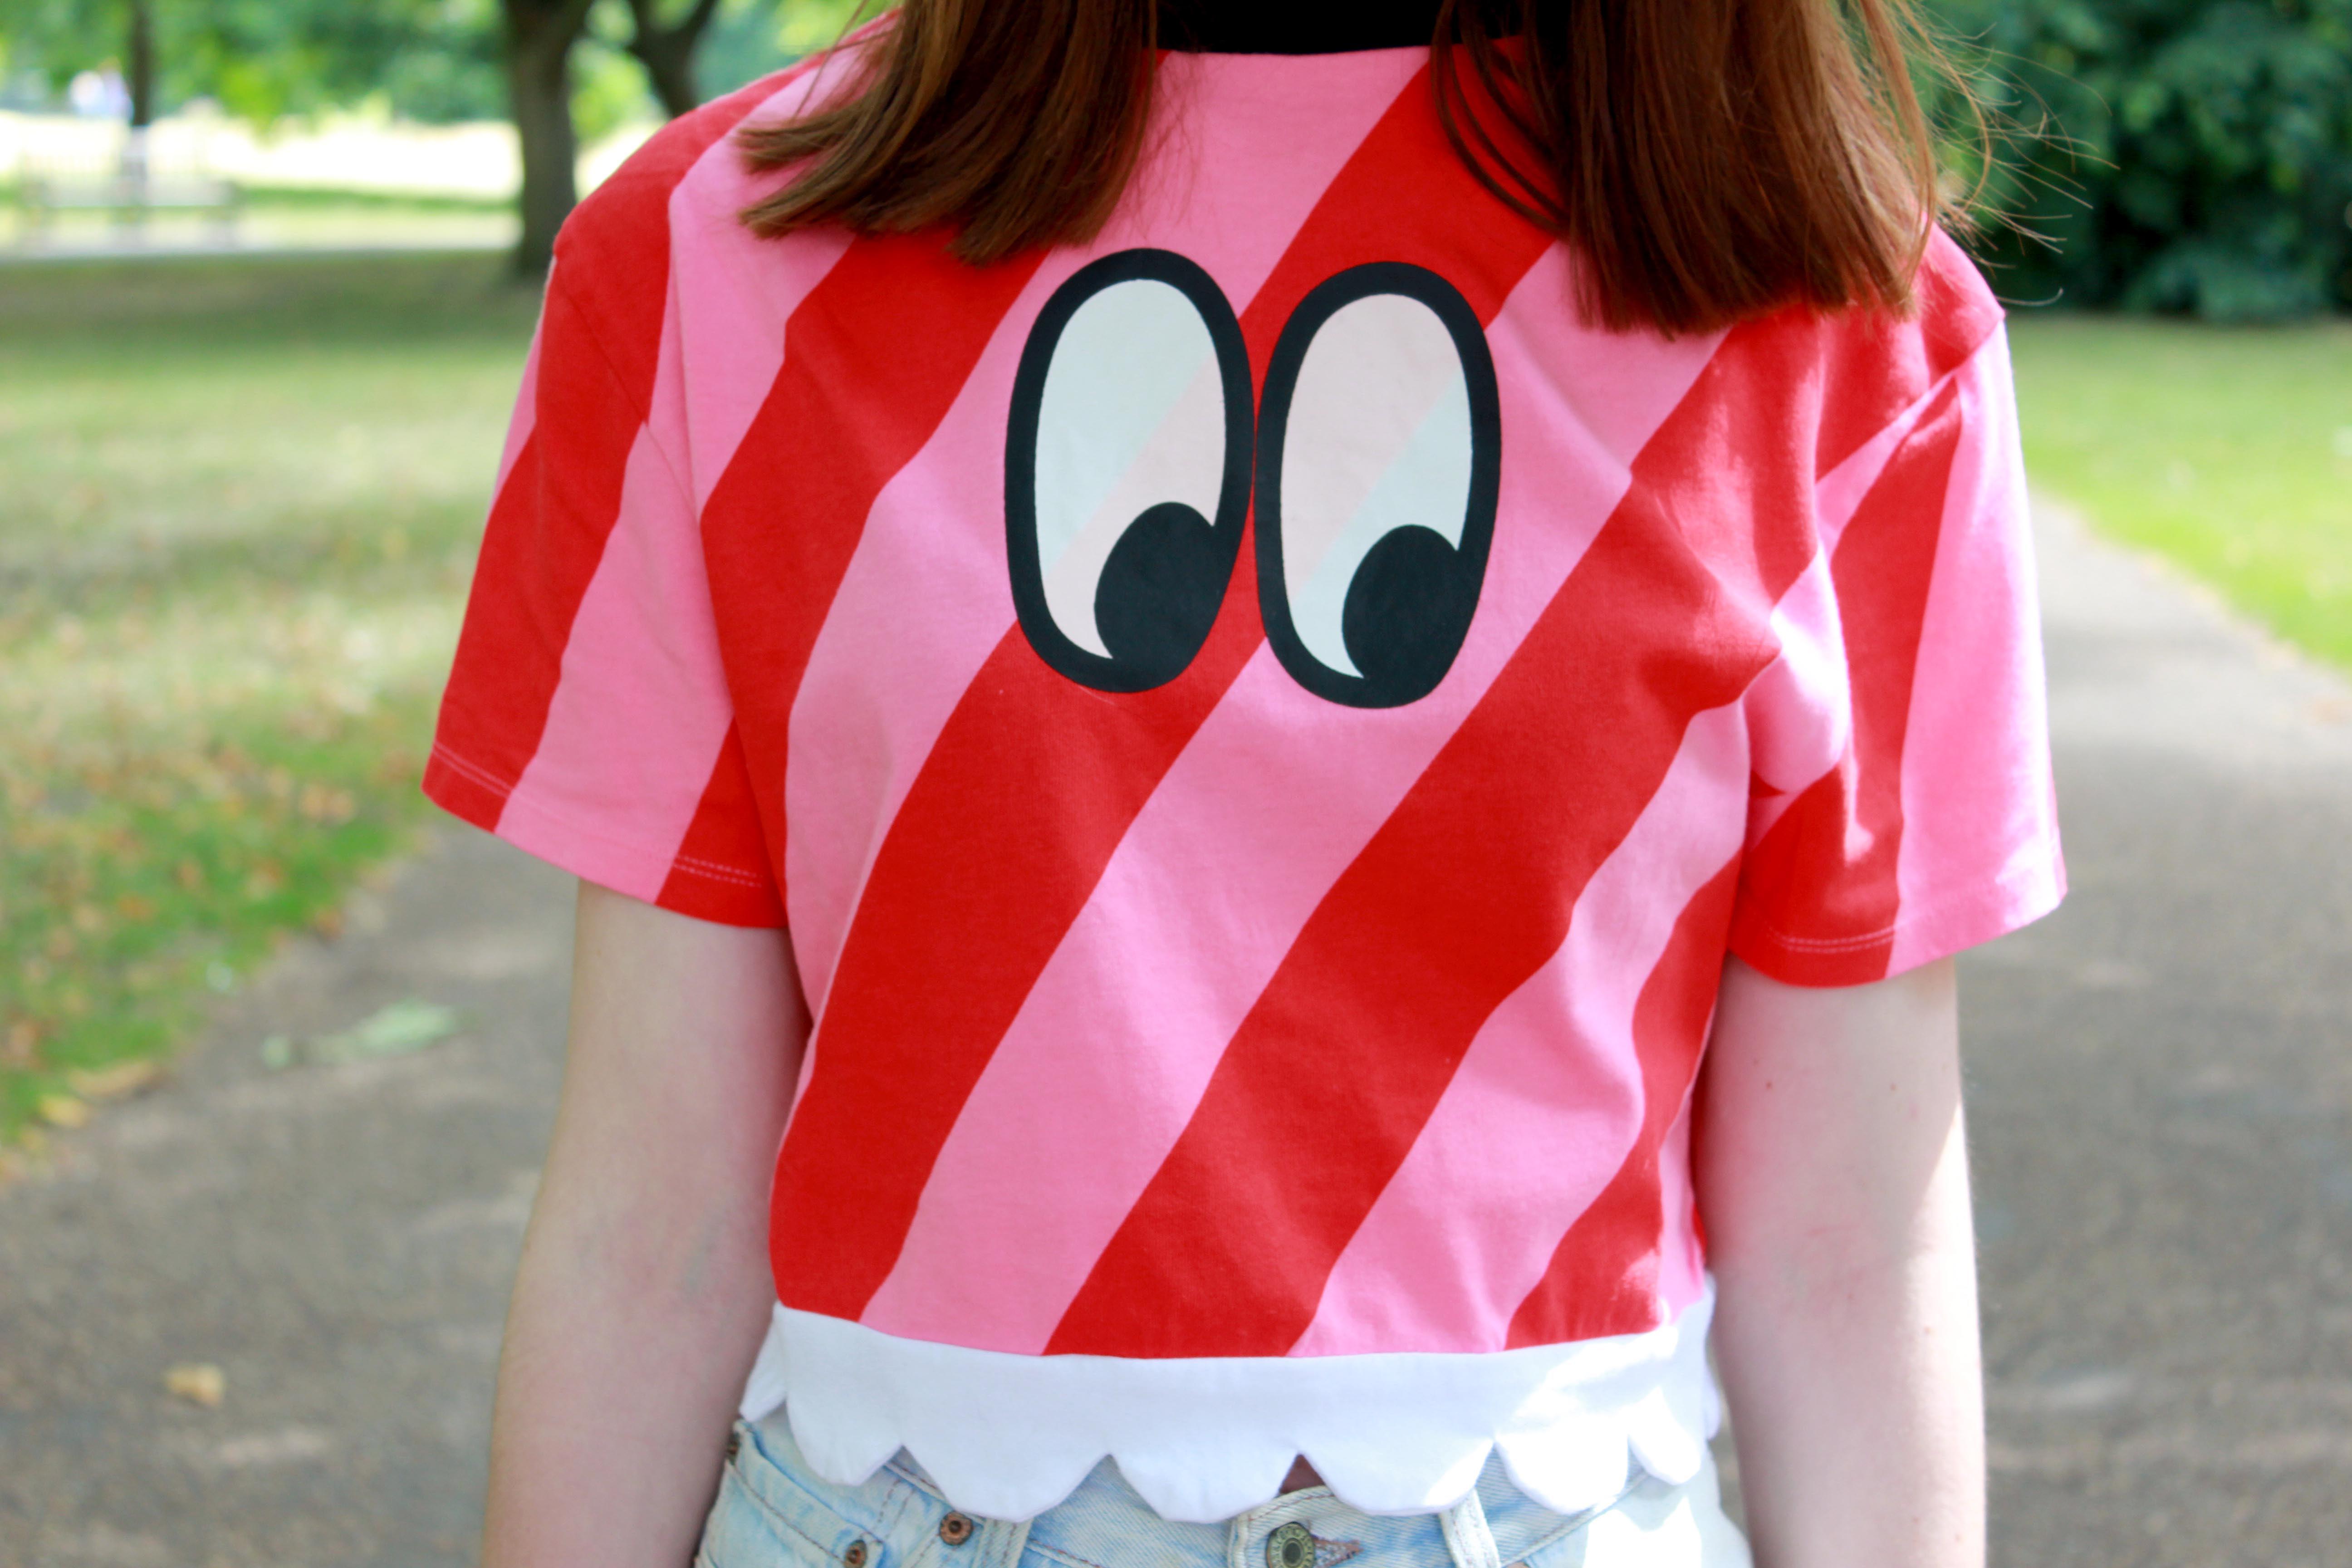 Fashion blogger wearing a Lazy Oaf eye print candy strip top